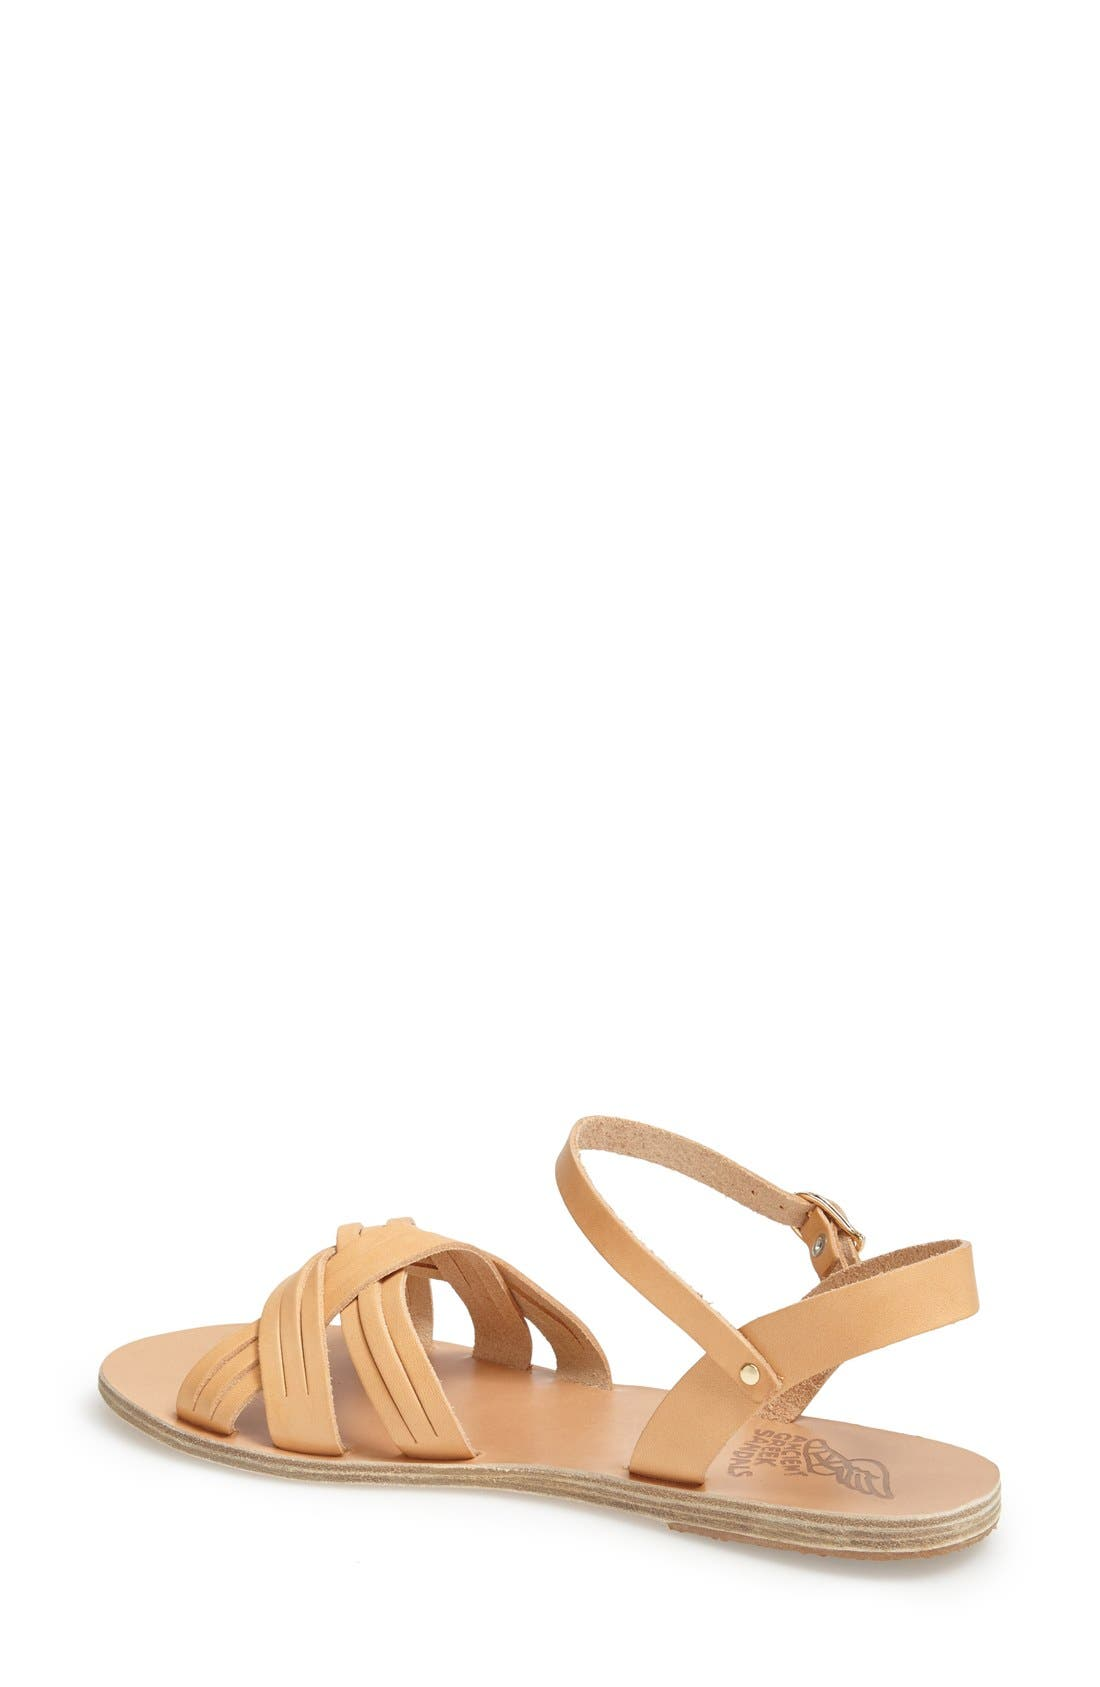 Alternate Image 2  - Ancient Greek Sandals 'Electra' Quarter Strap Sandal (Women)